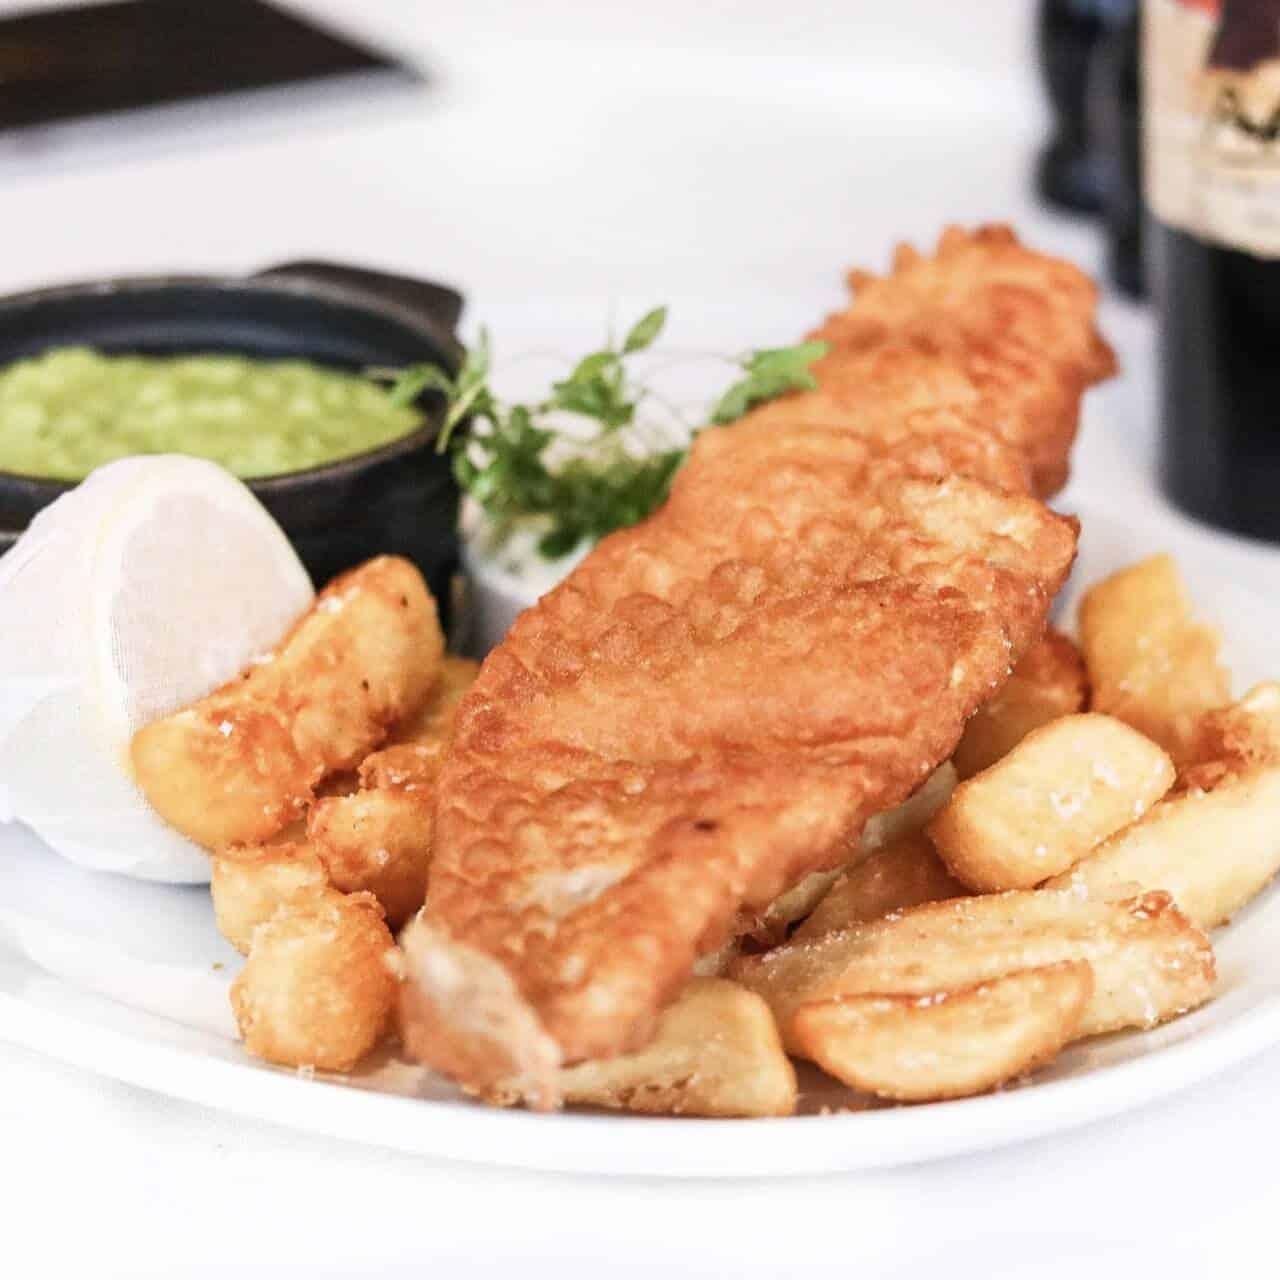 Cadbury House Hotel Fish & Chips